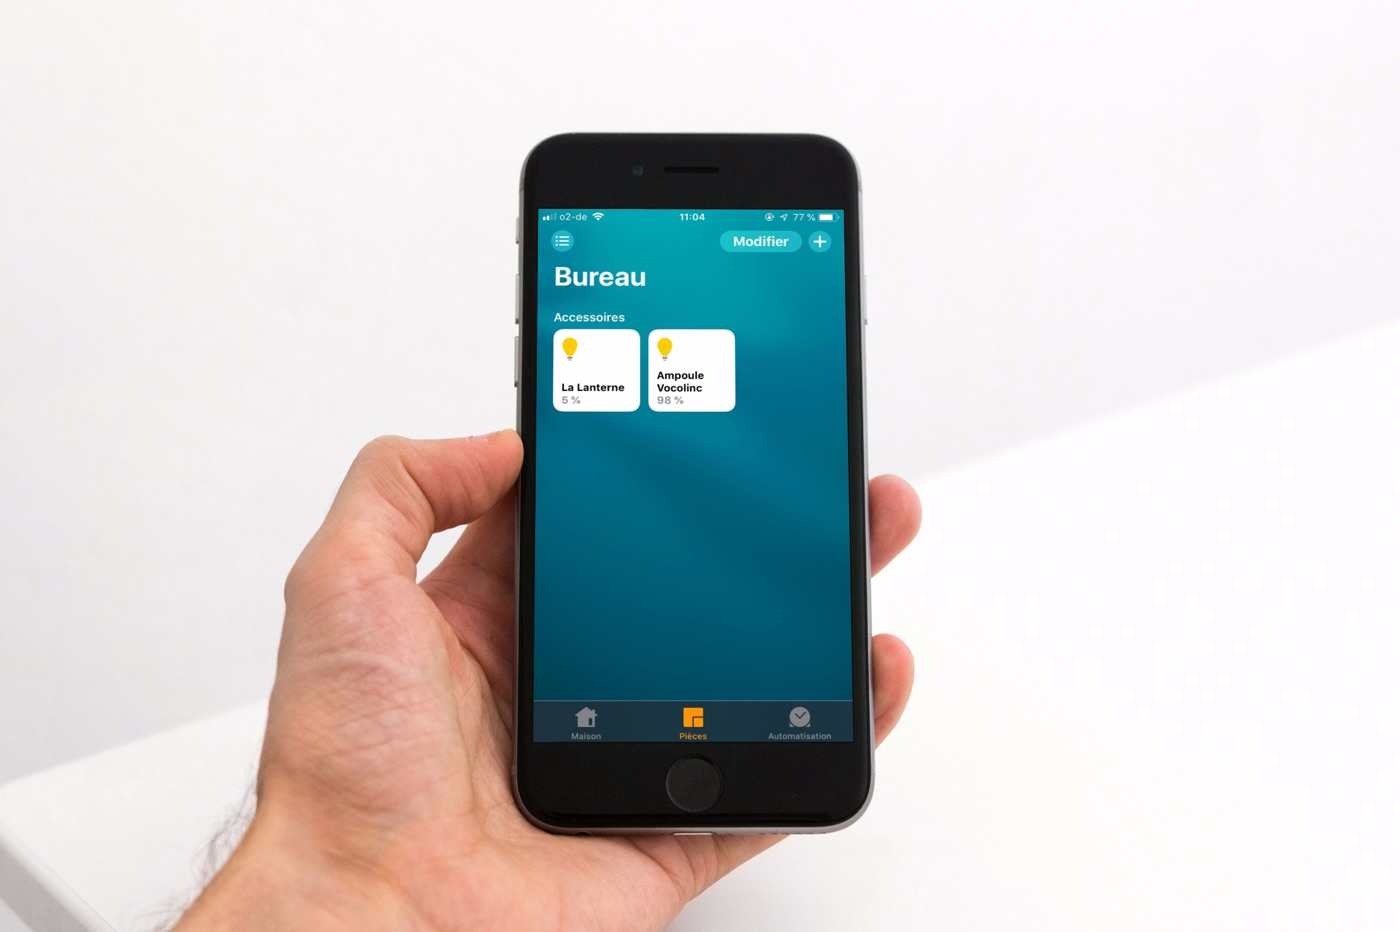 iPhone 6s app Maison HomeKit iOS 13 fond écran